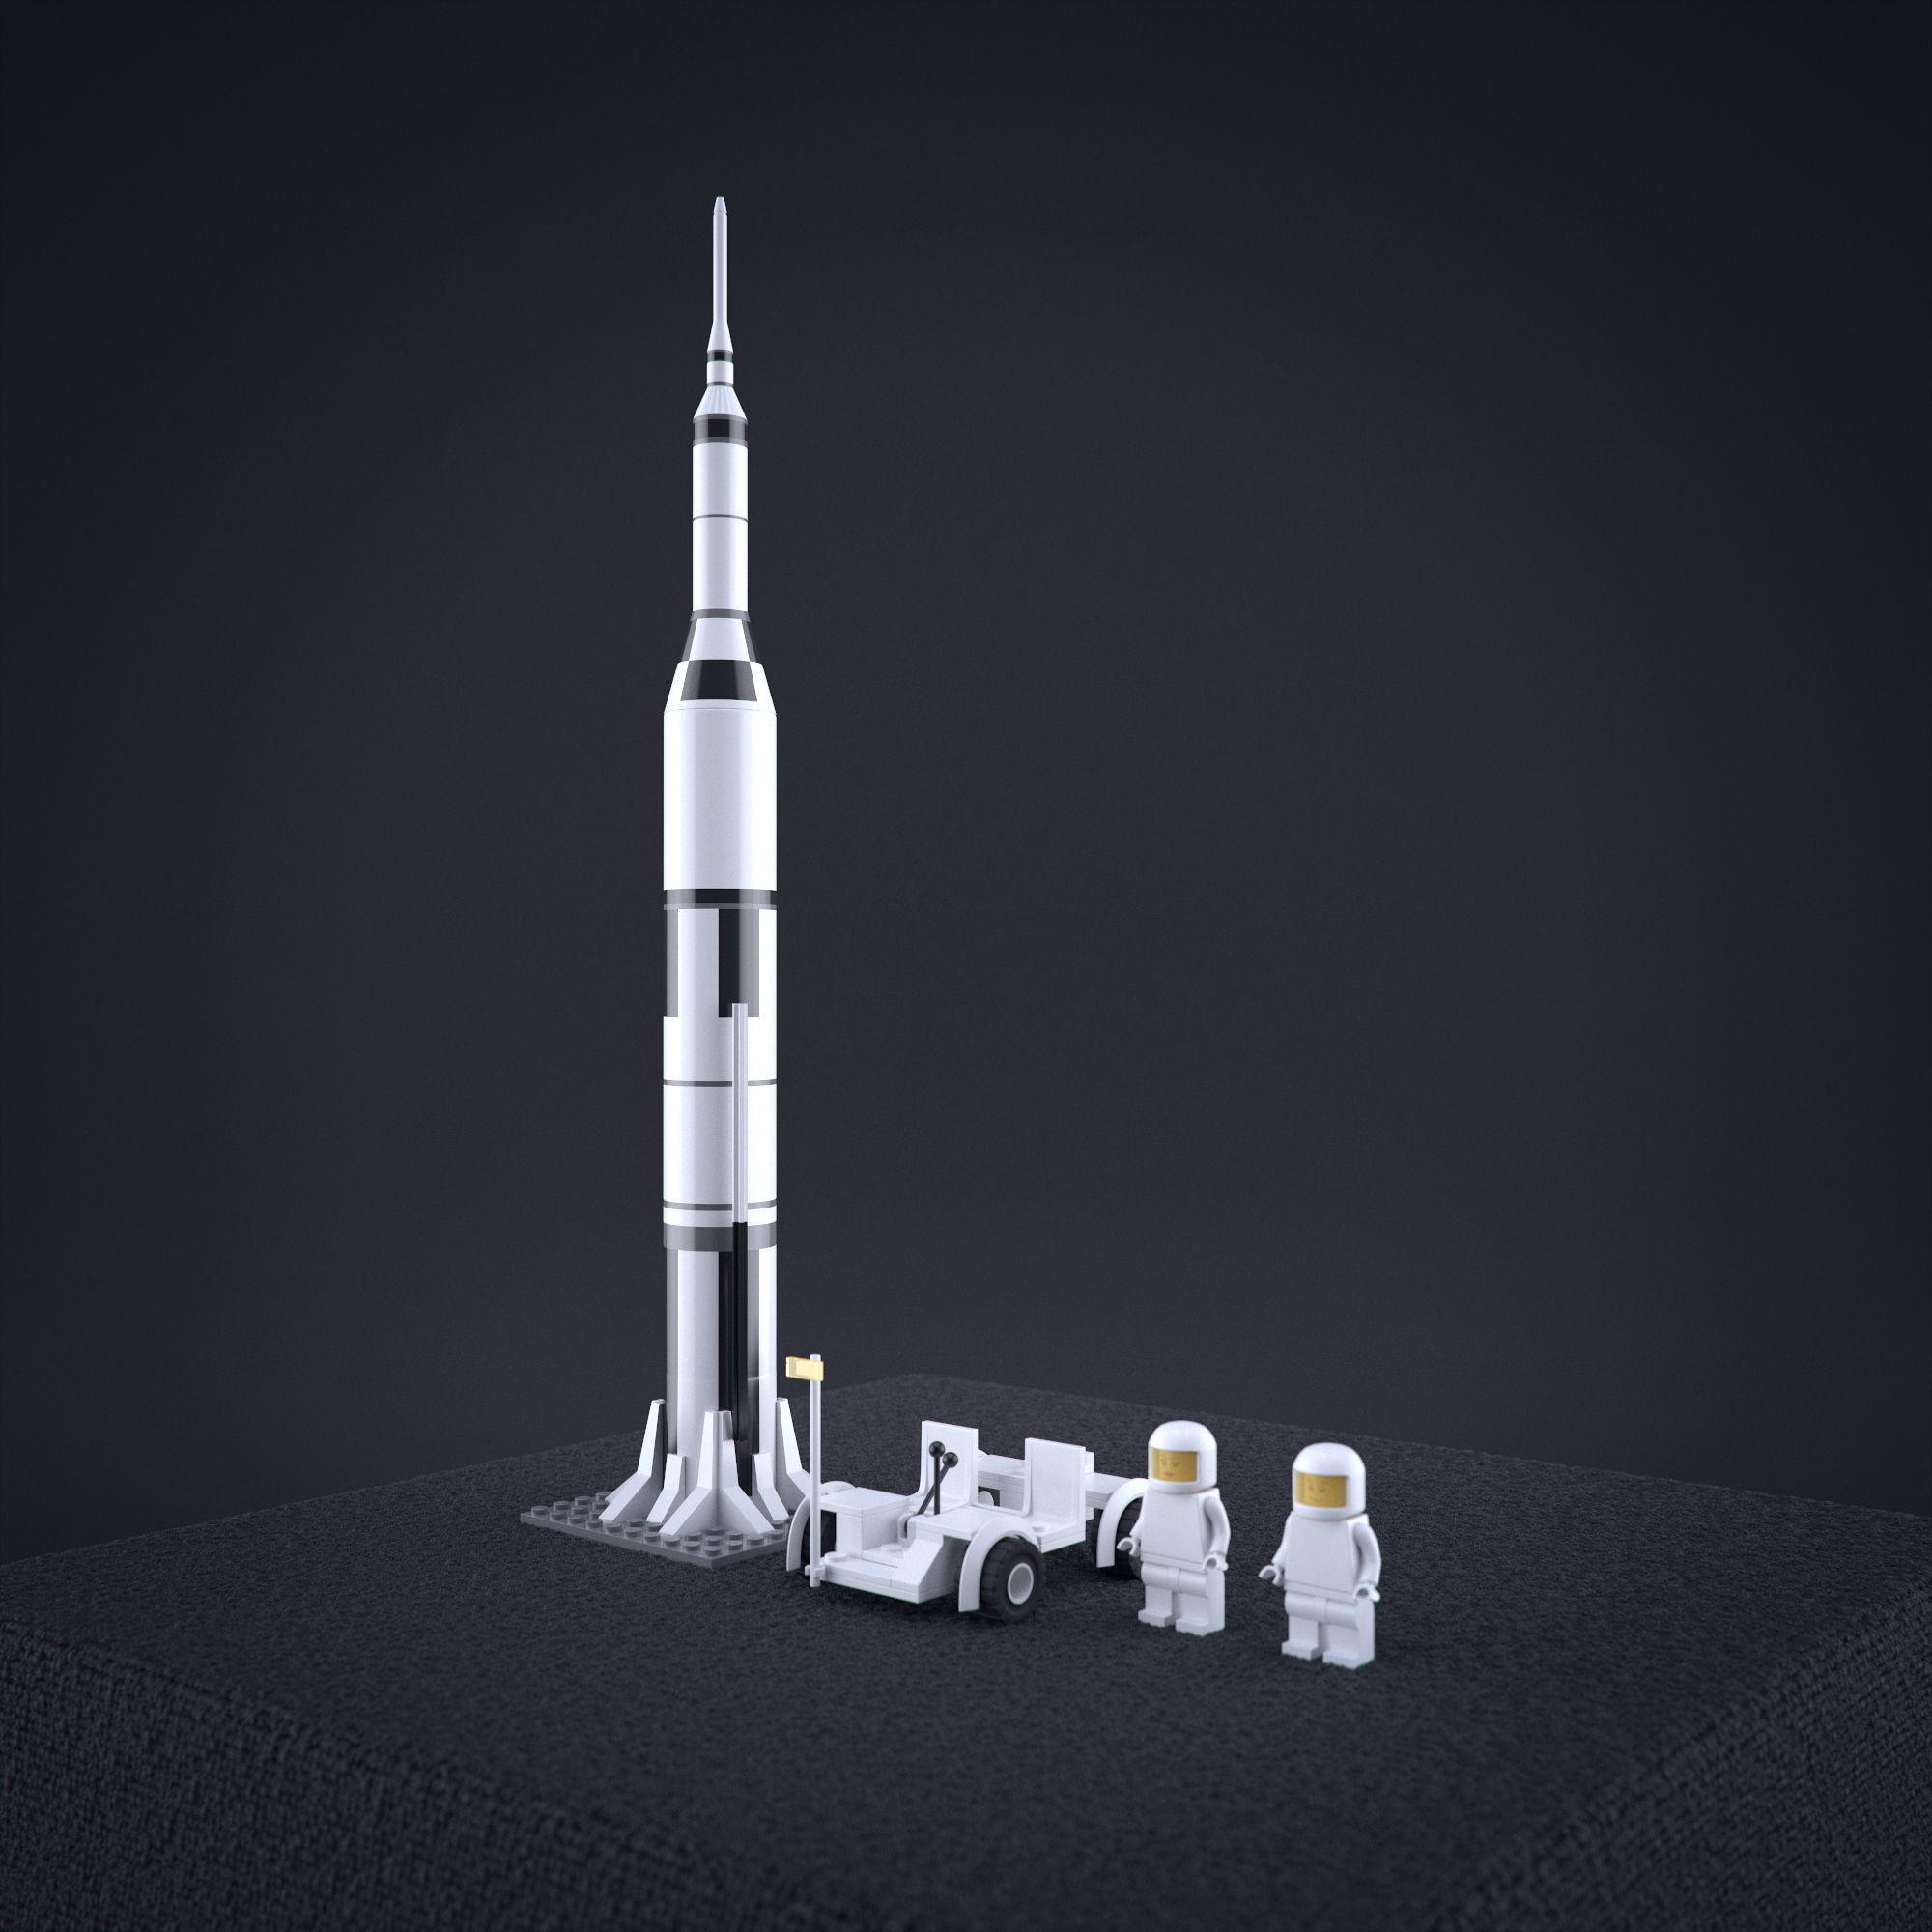 Lego Nasa Apollo Saturn Rocket with moon vehicel and astronauts